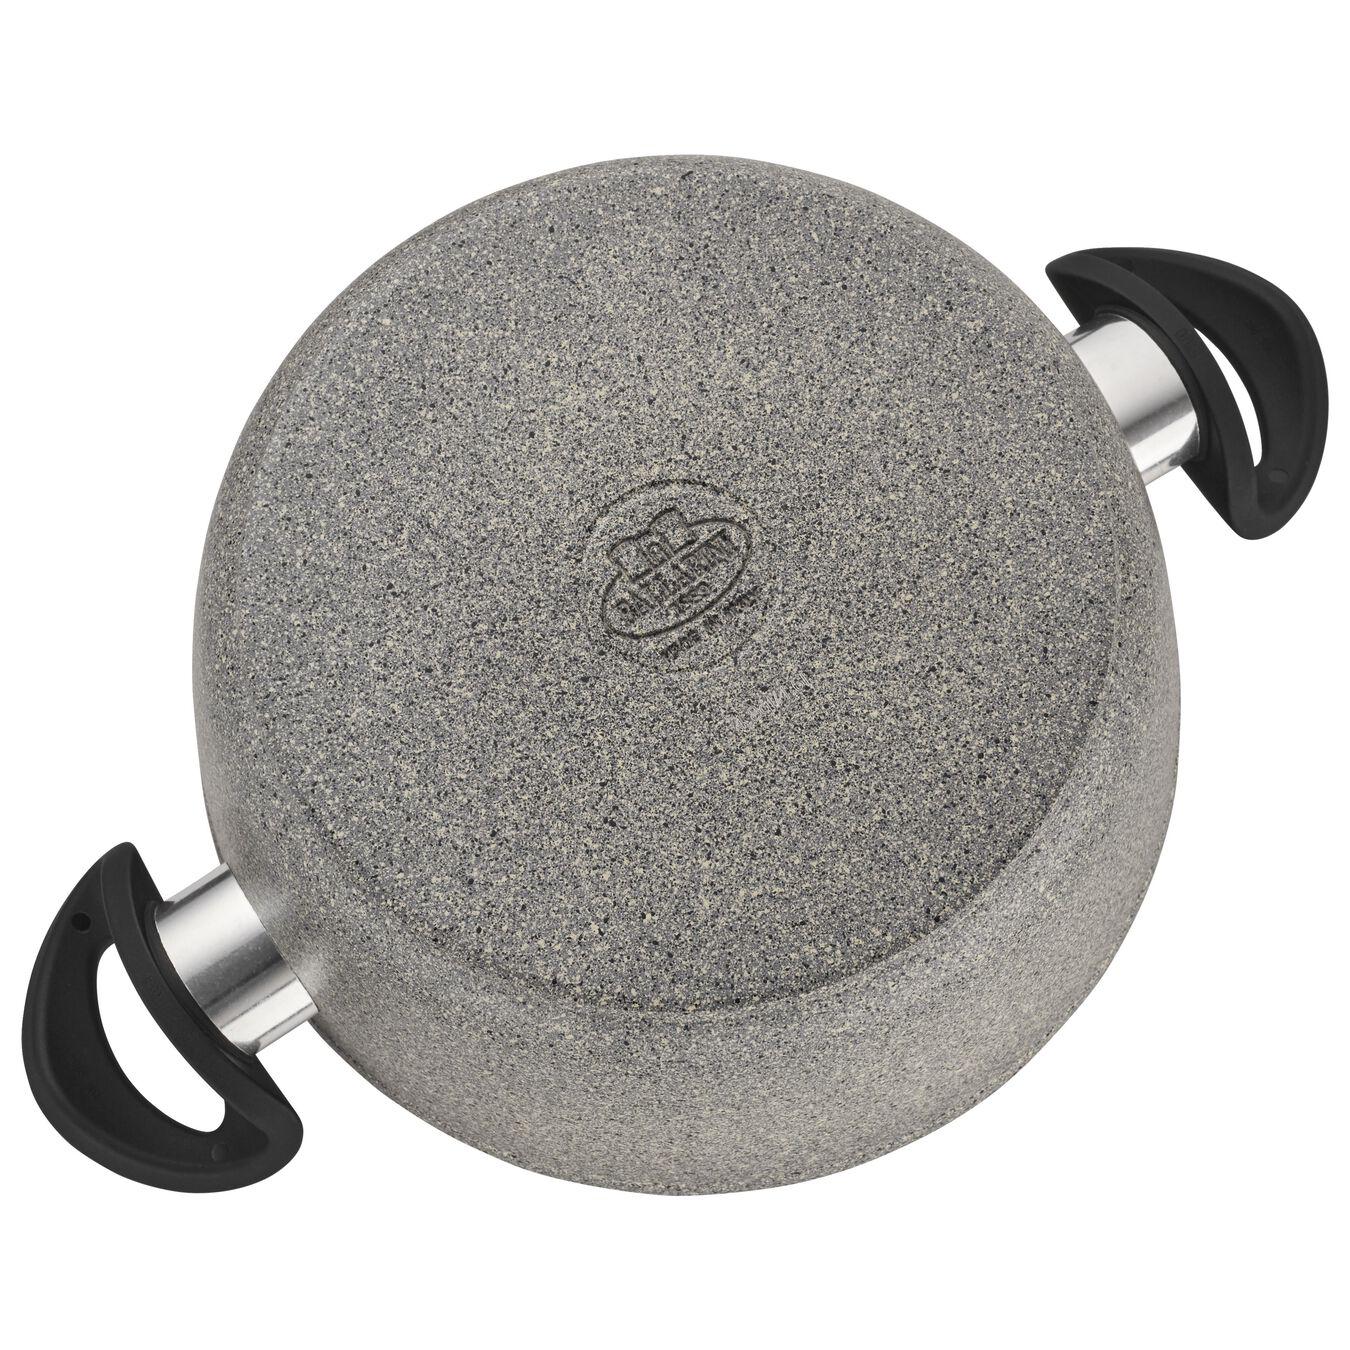 152.25 oz, round, Cocotte,,large 4